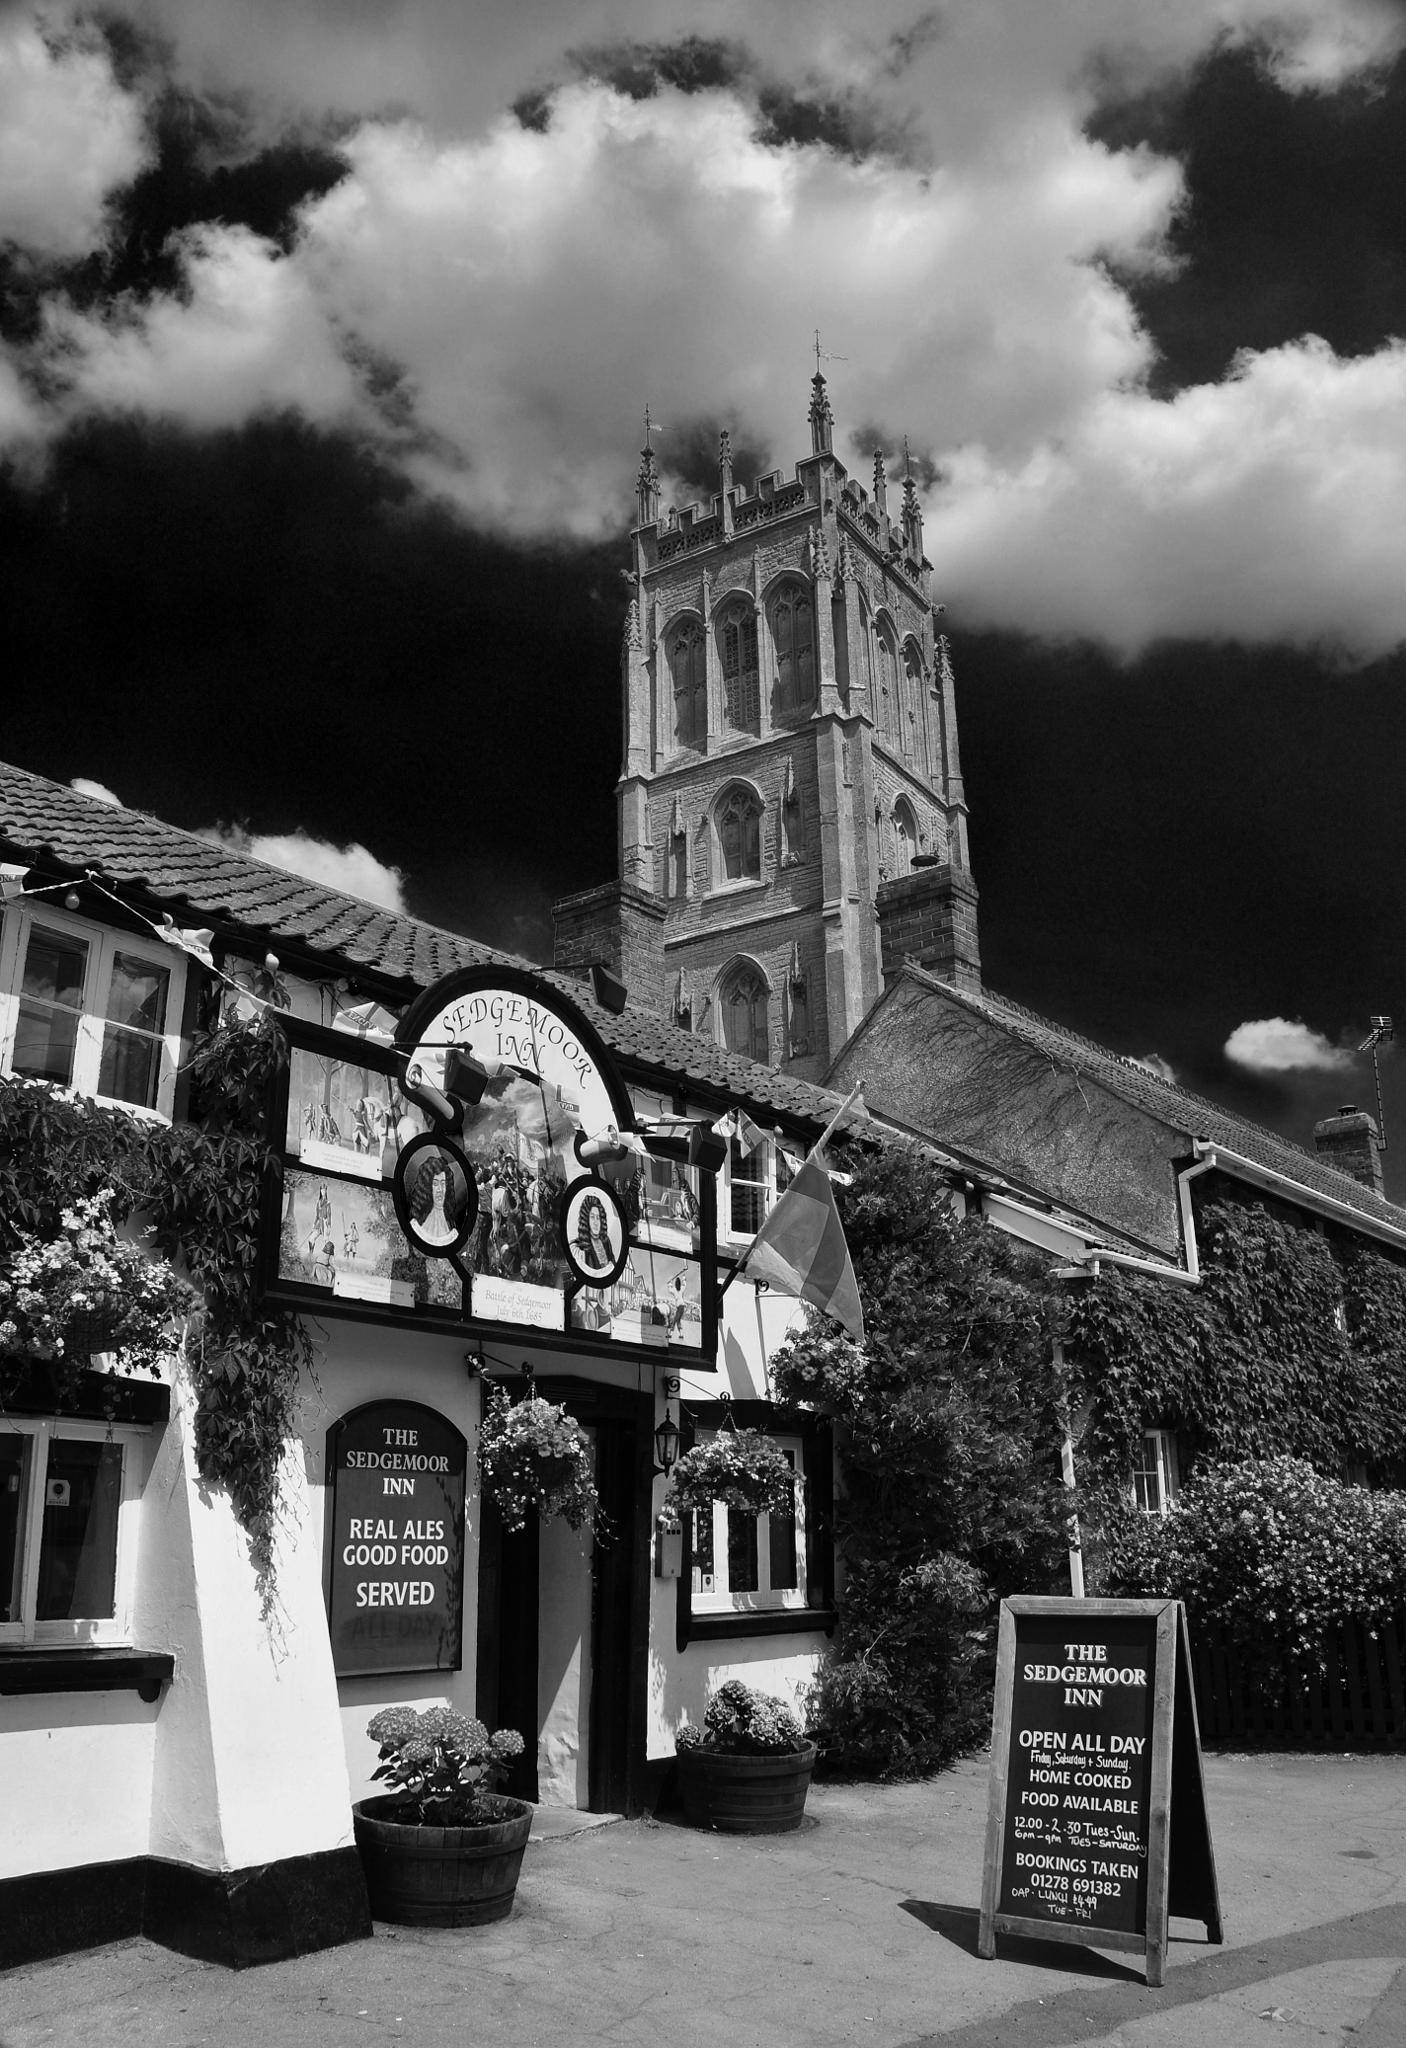 The Sedgemoor Inn by lenbage